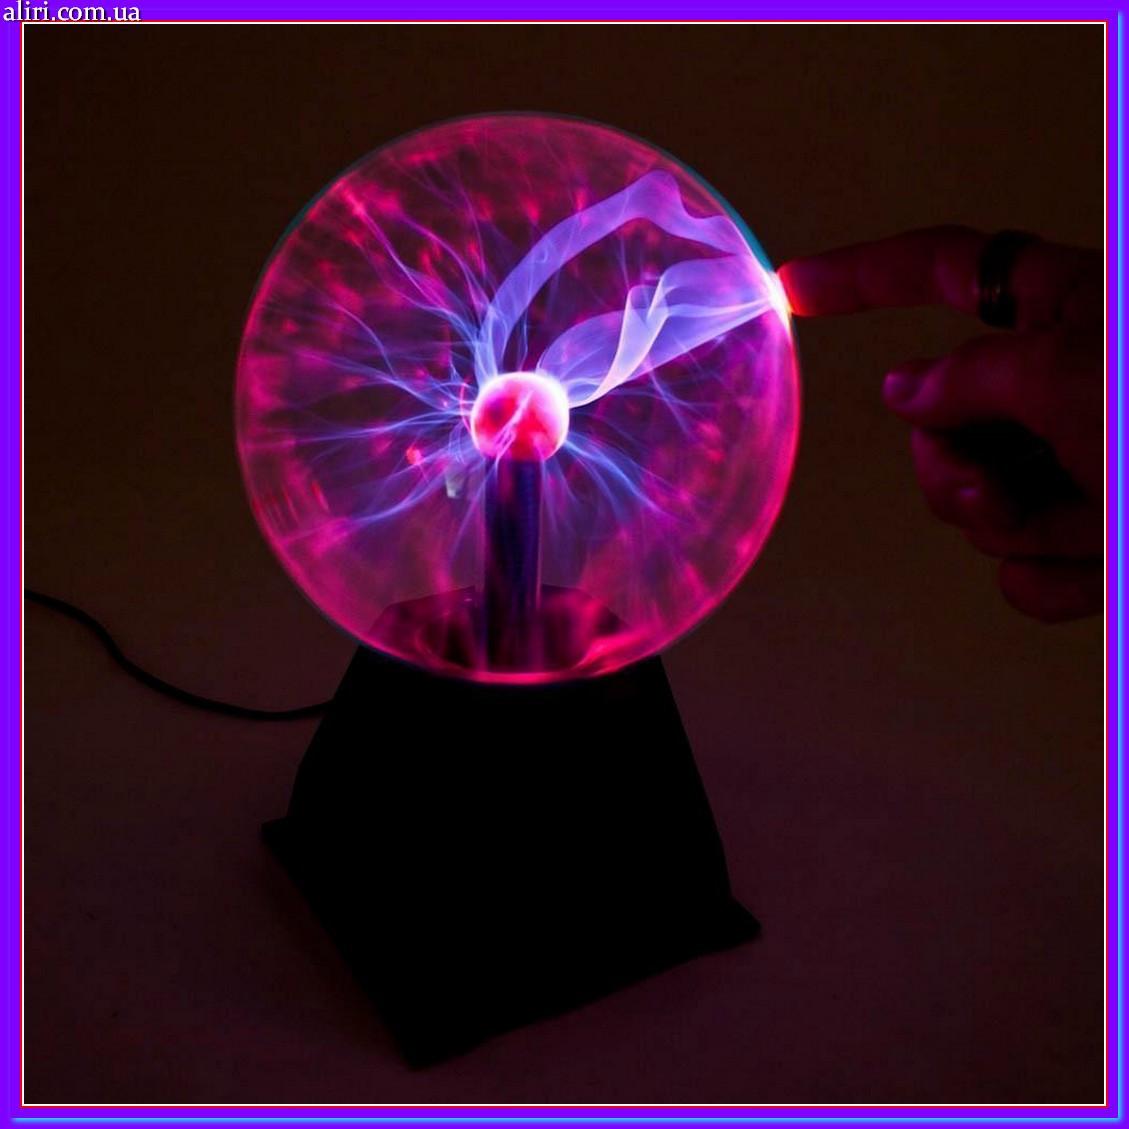 Плазменный шар ночник светильник Plasma Light Ball